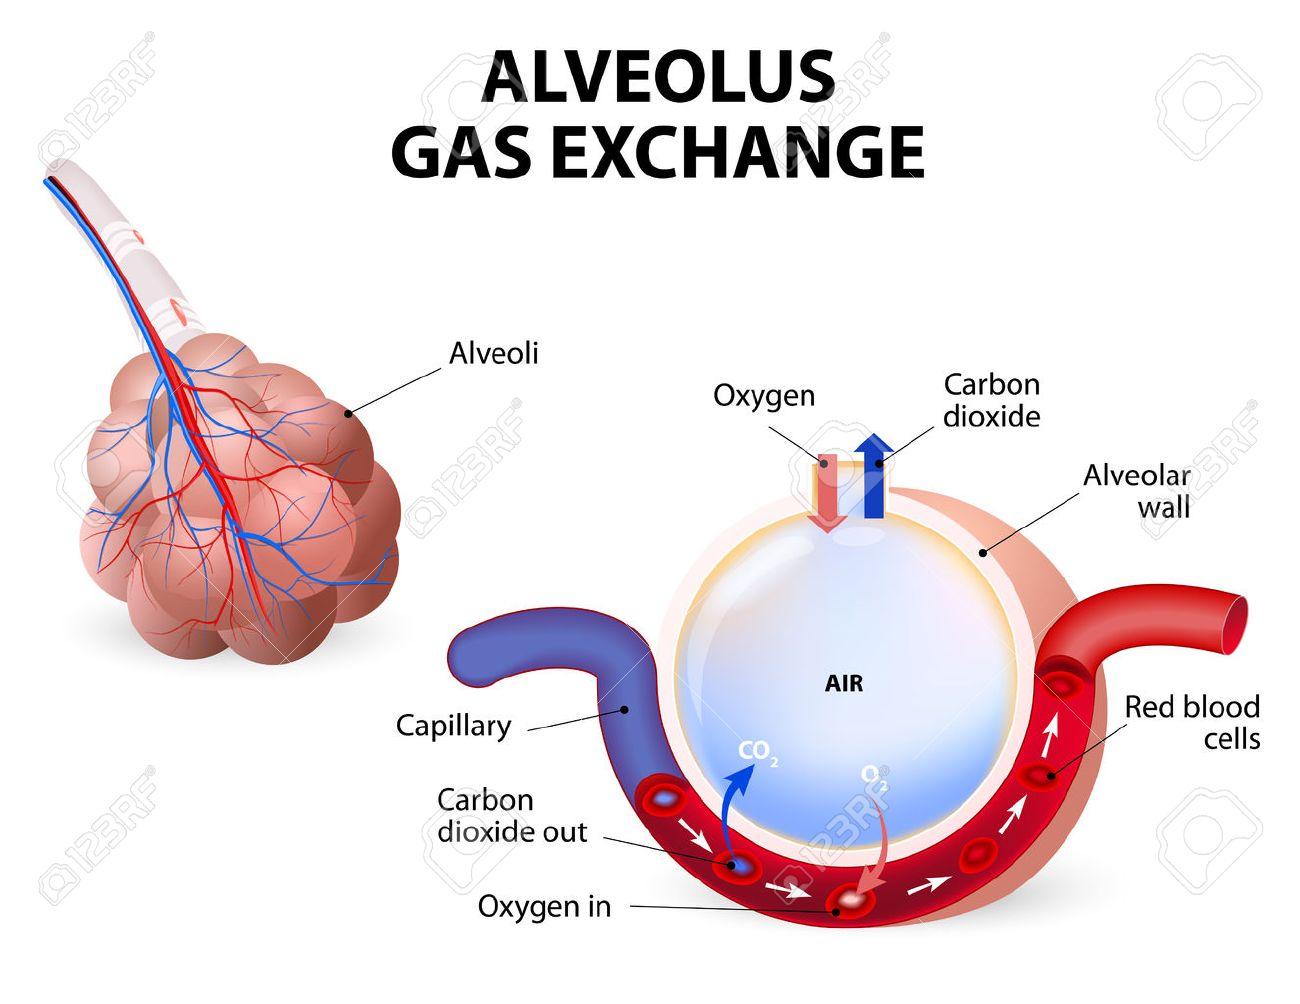 Alveolus gas exchange alveoli and capillaries in the lungs royalty alveolus gas exchange alveoli and capillaries in the lungs stock vector 34806367 ccuart Choice Image